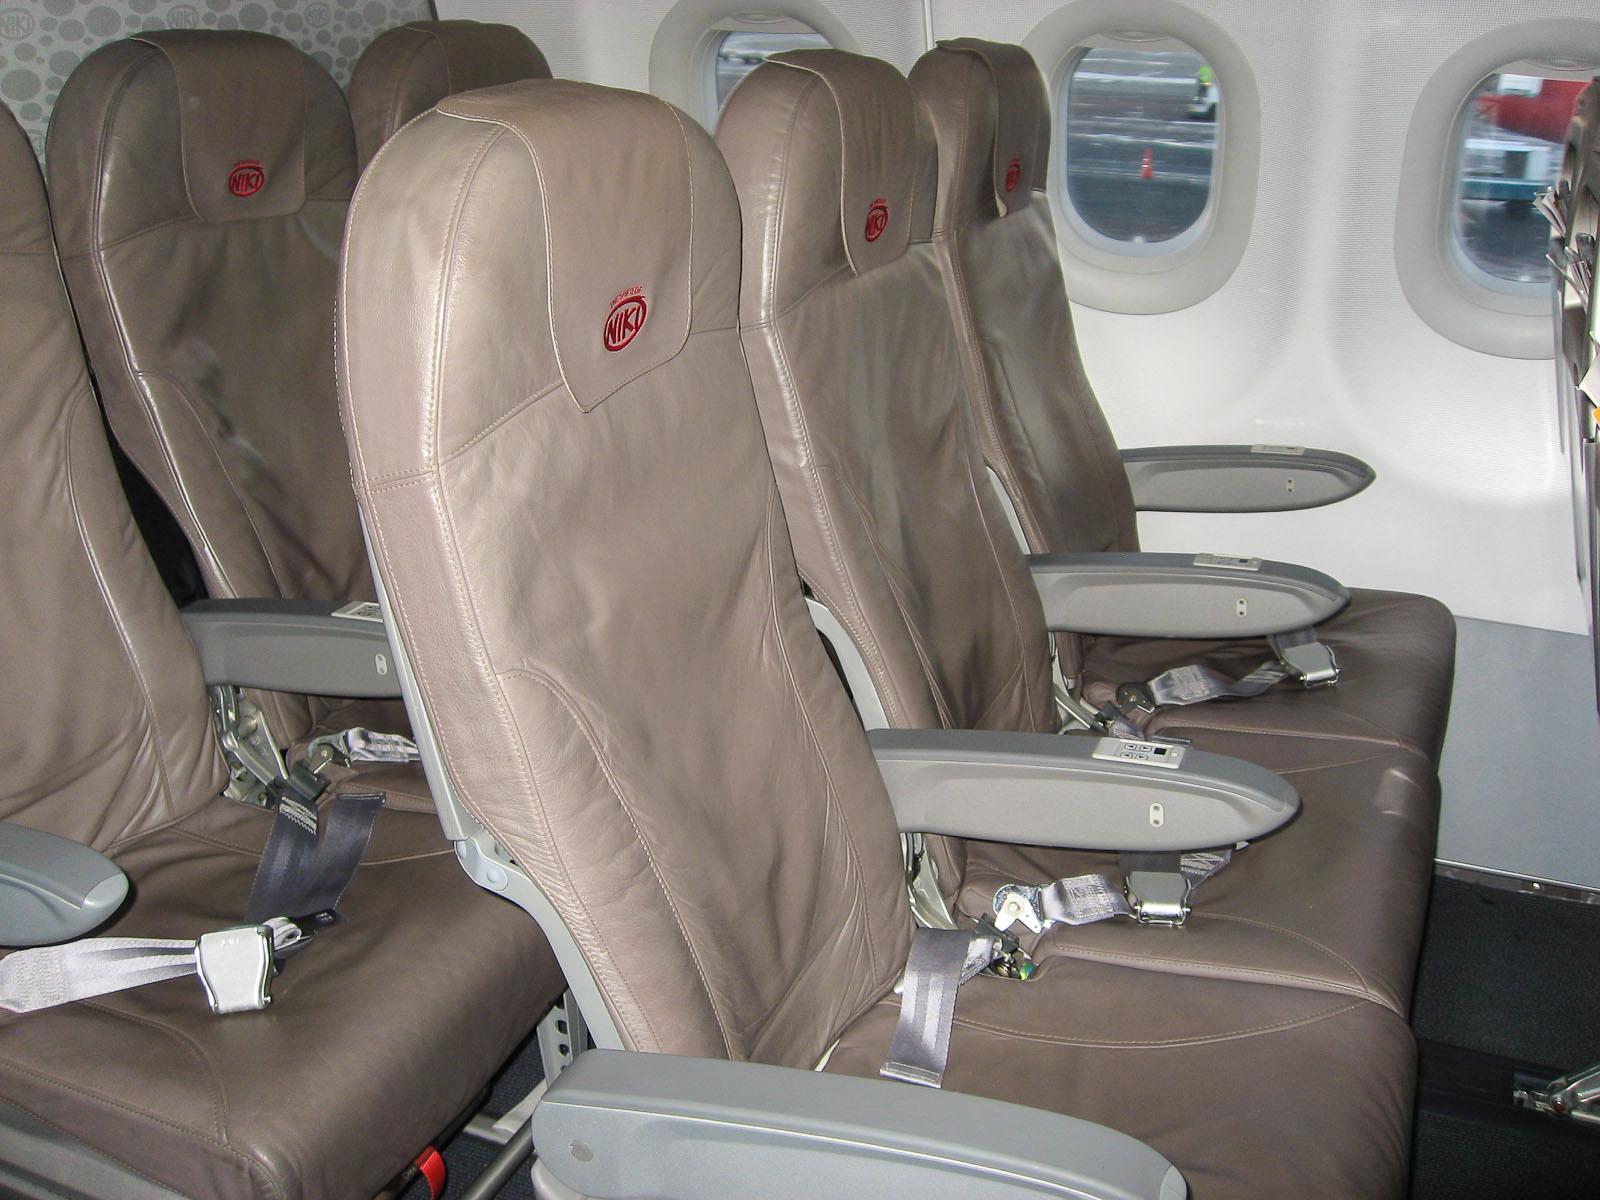 Кресла самолета Airbus A320 авиакомпании Niki